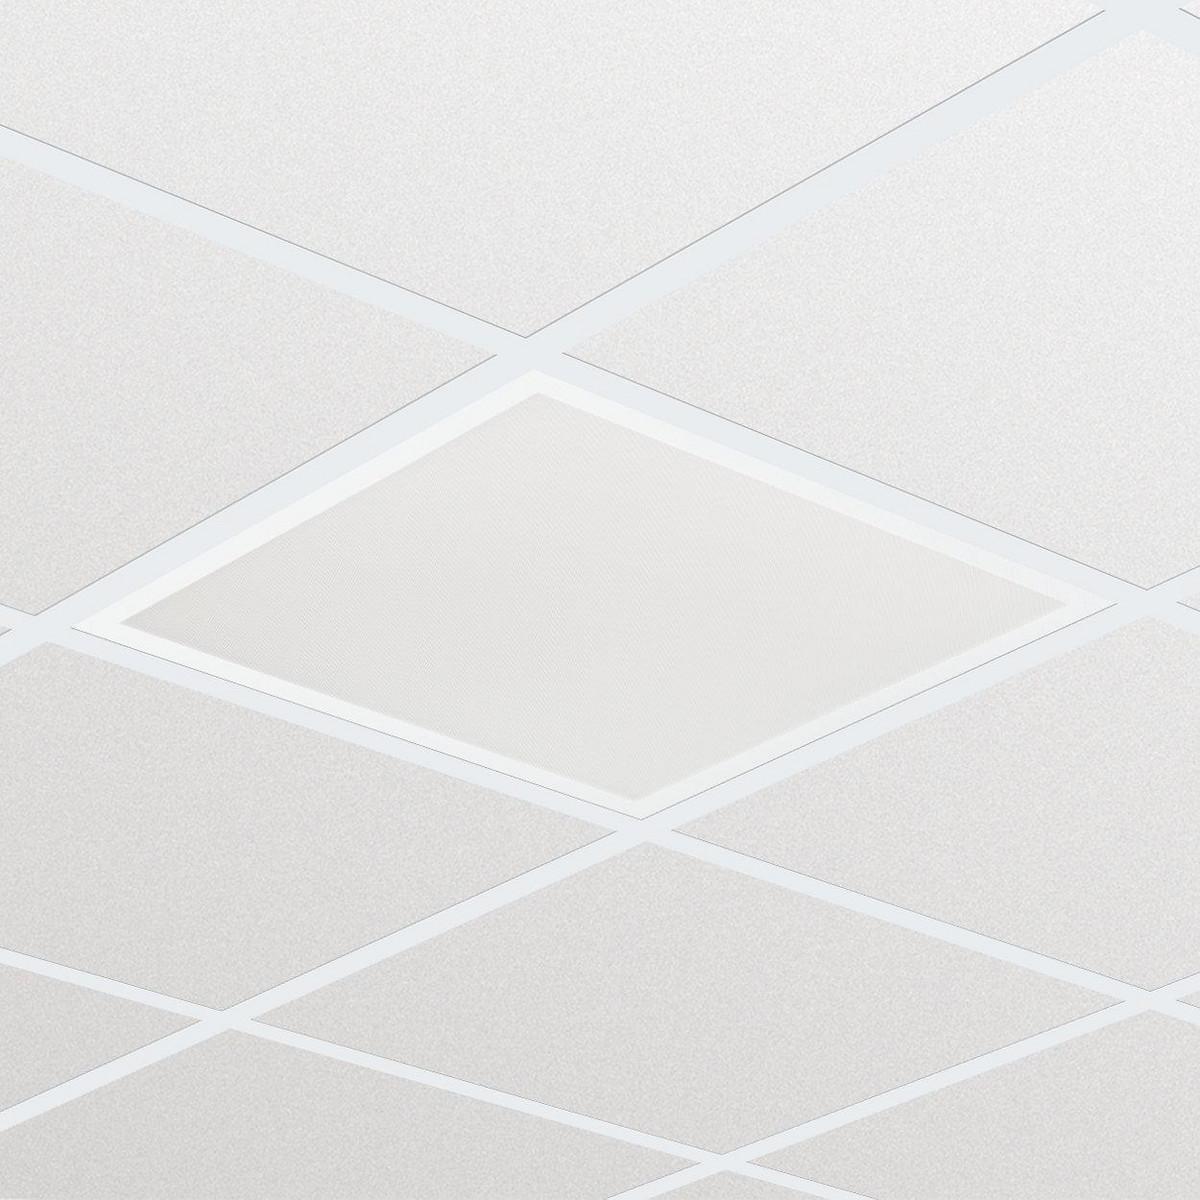 Philips SlimBlend Indbyg Kvadratisk RC400B LED 3600lm/830 DALI 60x60